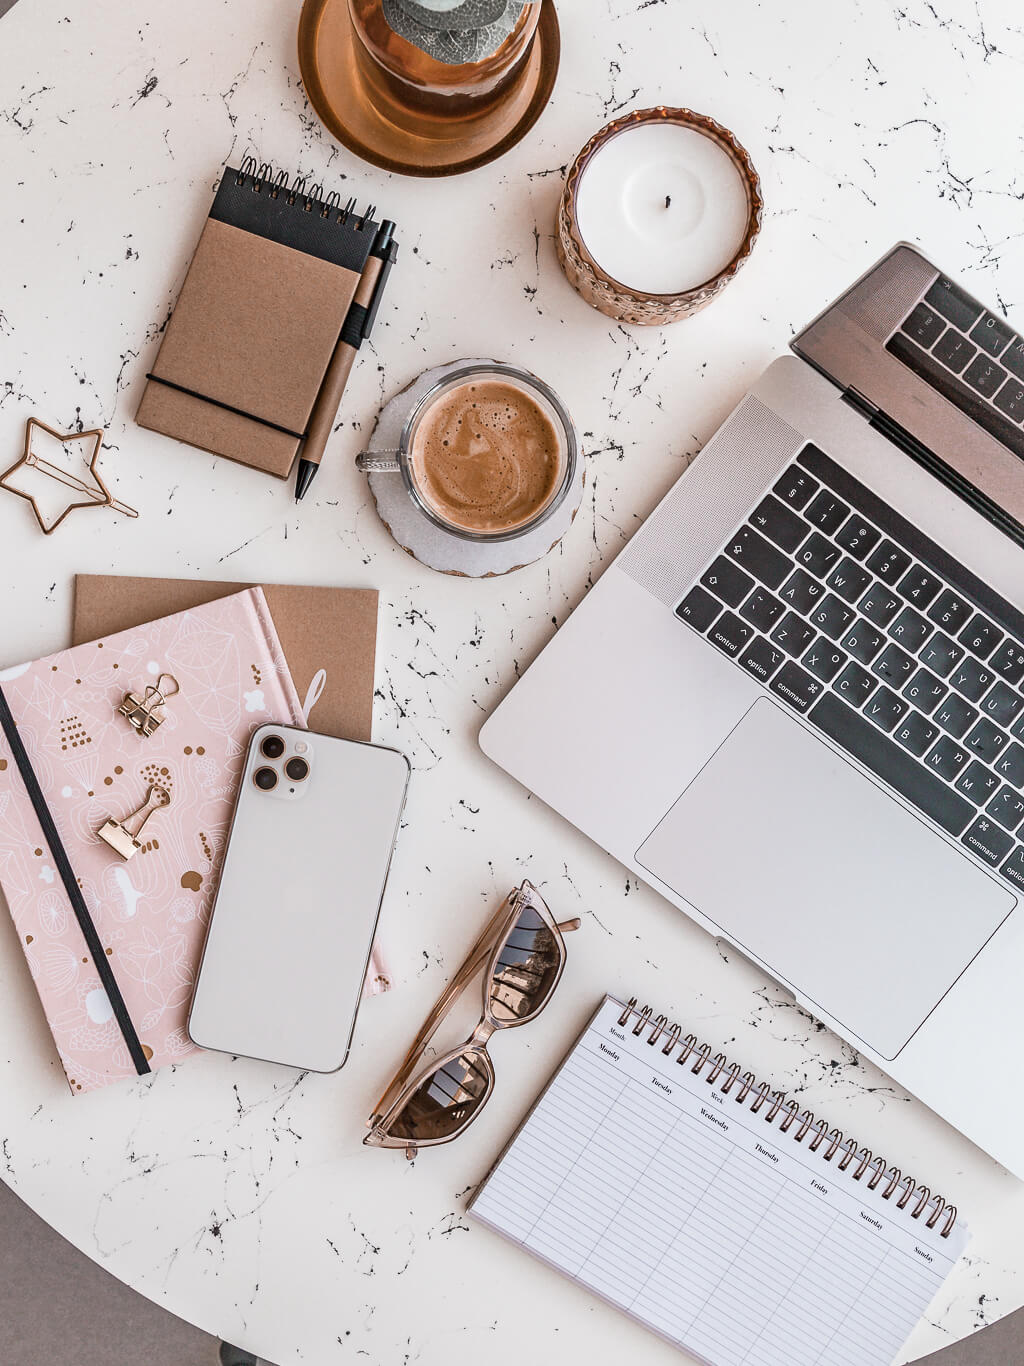 Why your business needs a blog - 5 reasons you shouldn't ignore | למה העסק שלך זקוק לבלוג – 5 סיבות שאסור לך להתעלם מהן